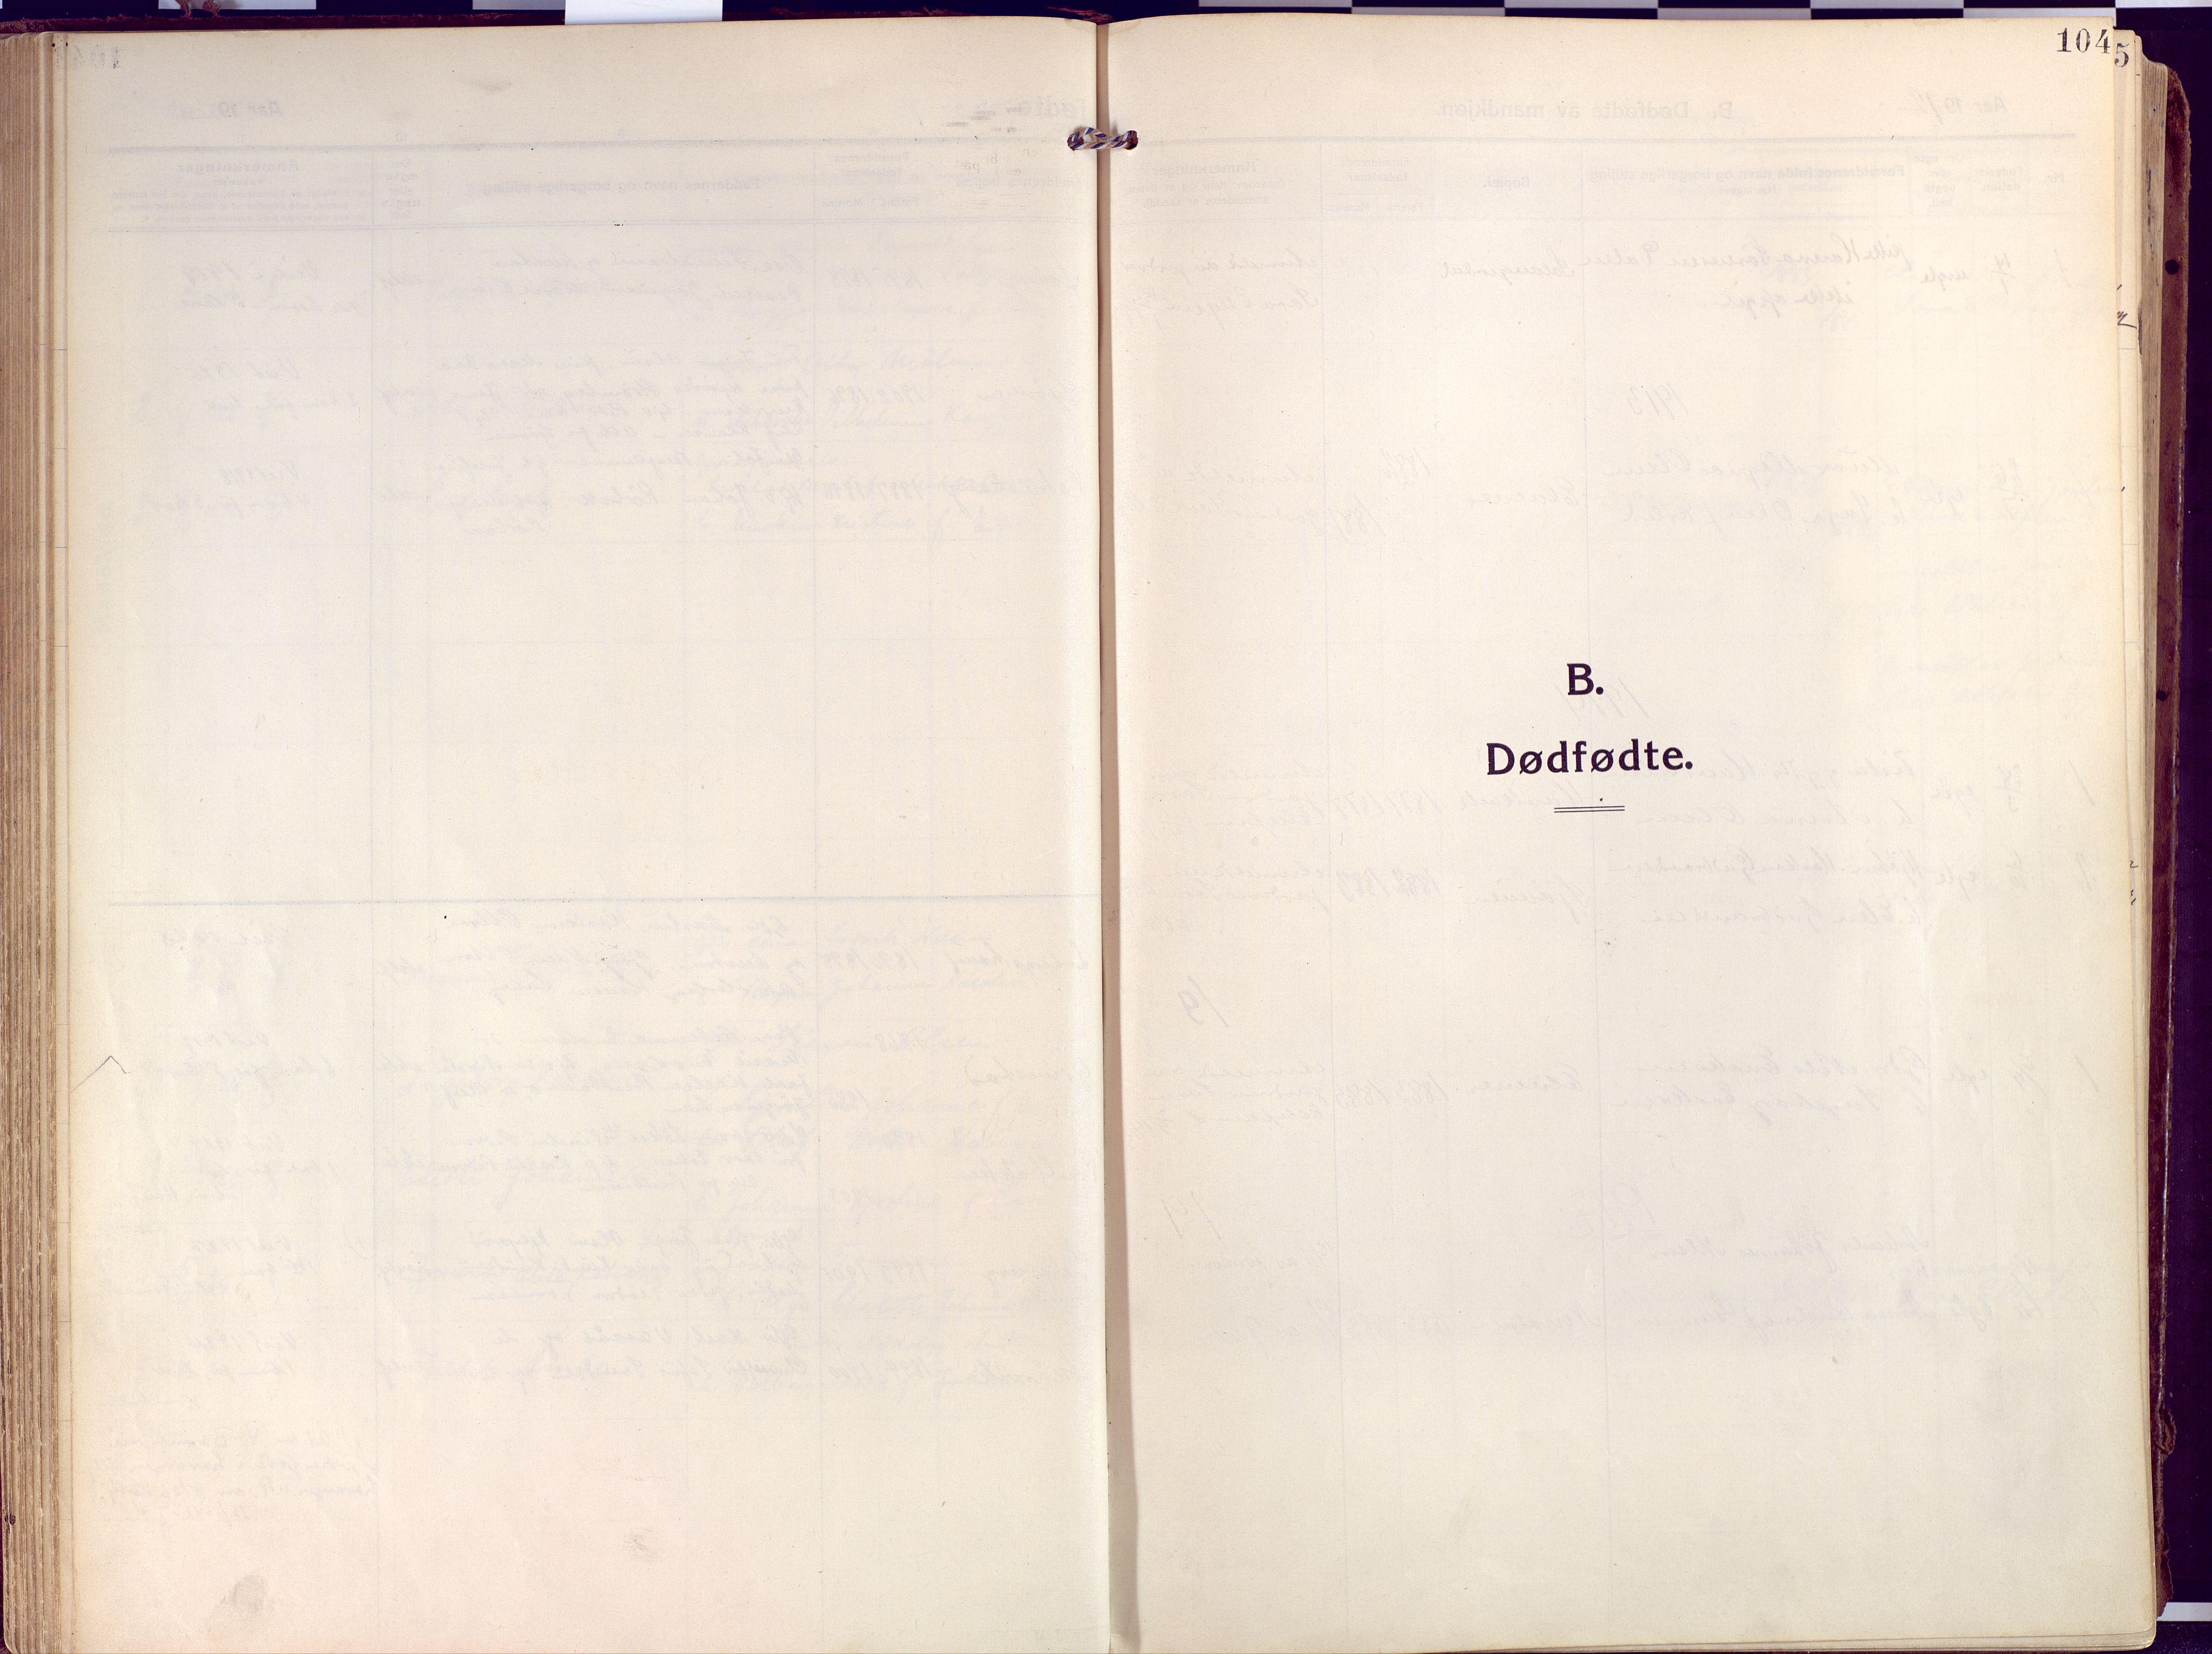 SATØ, Salangen sokneprestembete, Ministerialbok nr. 4, 1912-1927, s. 104